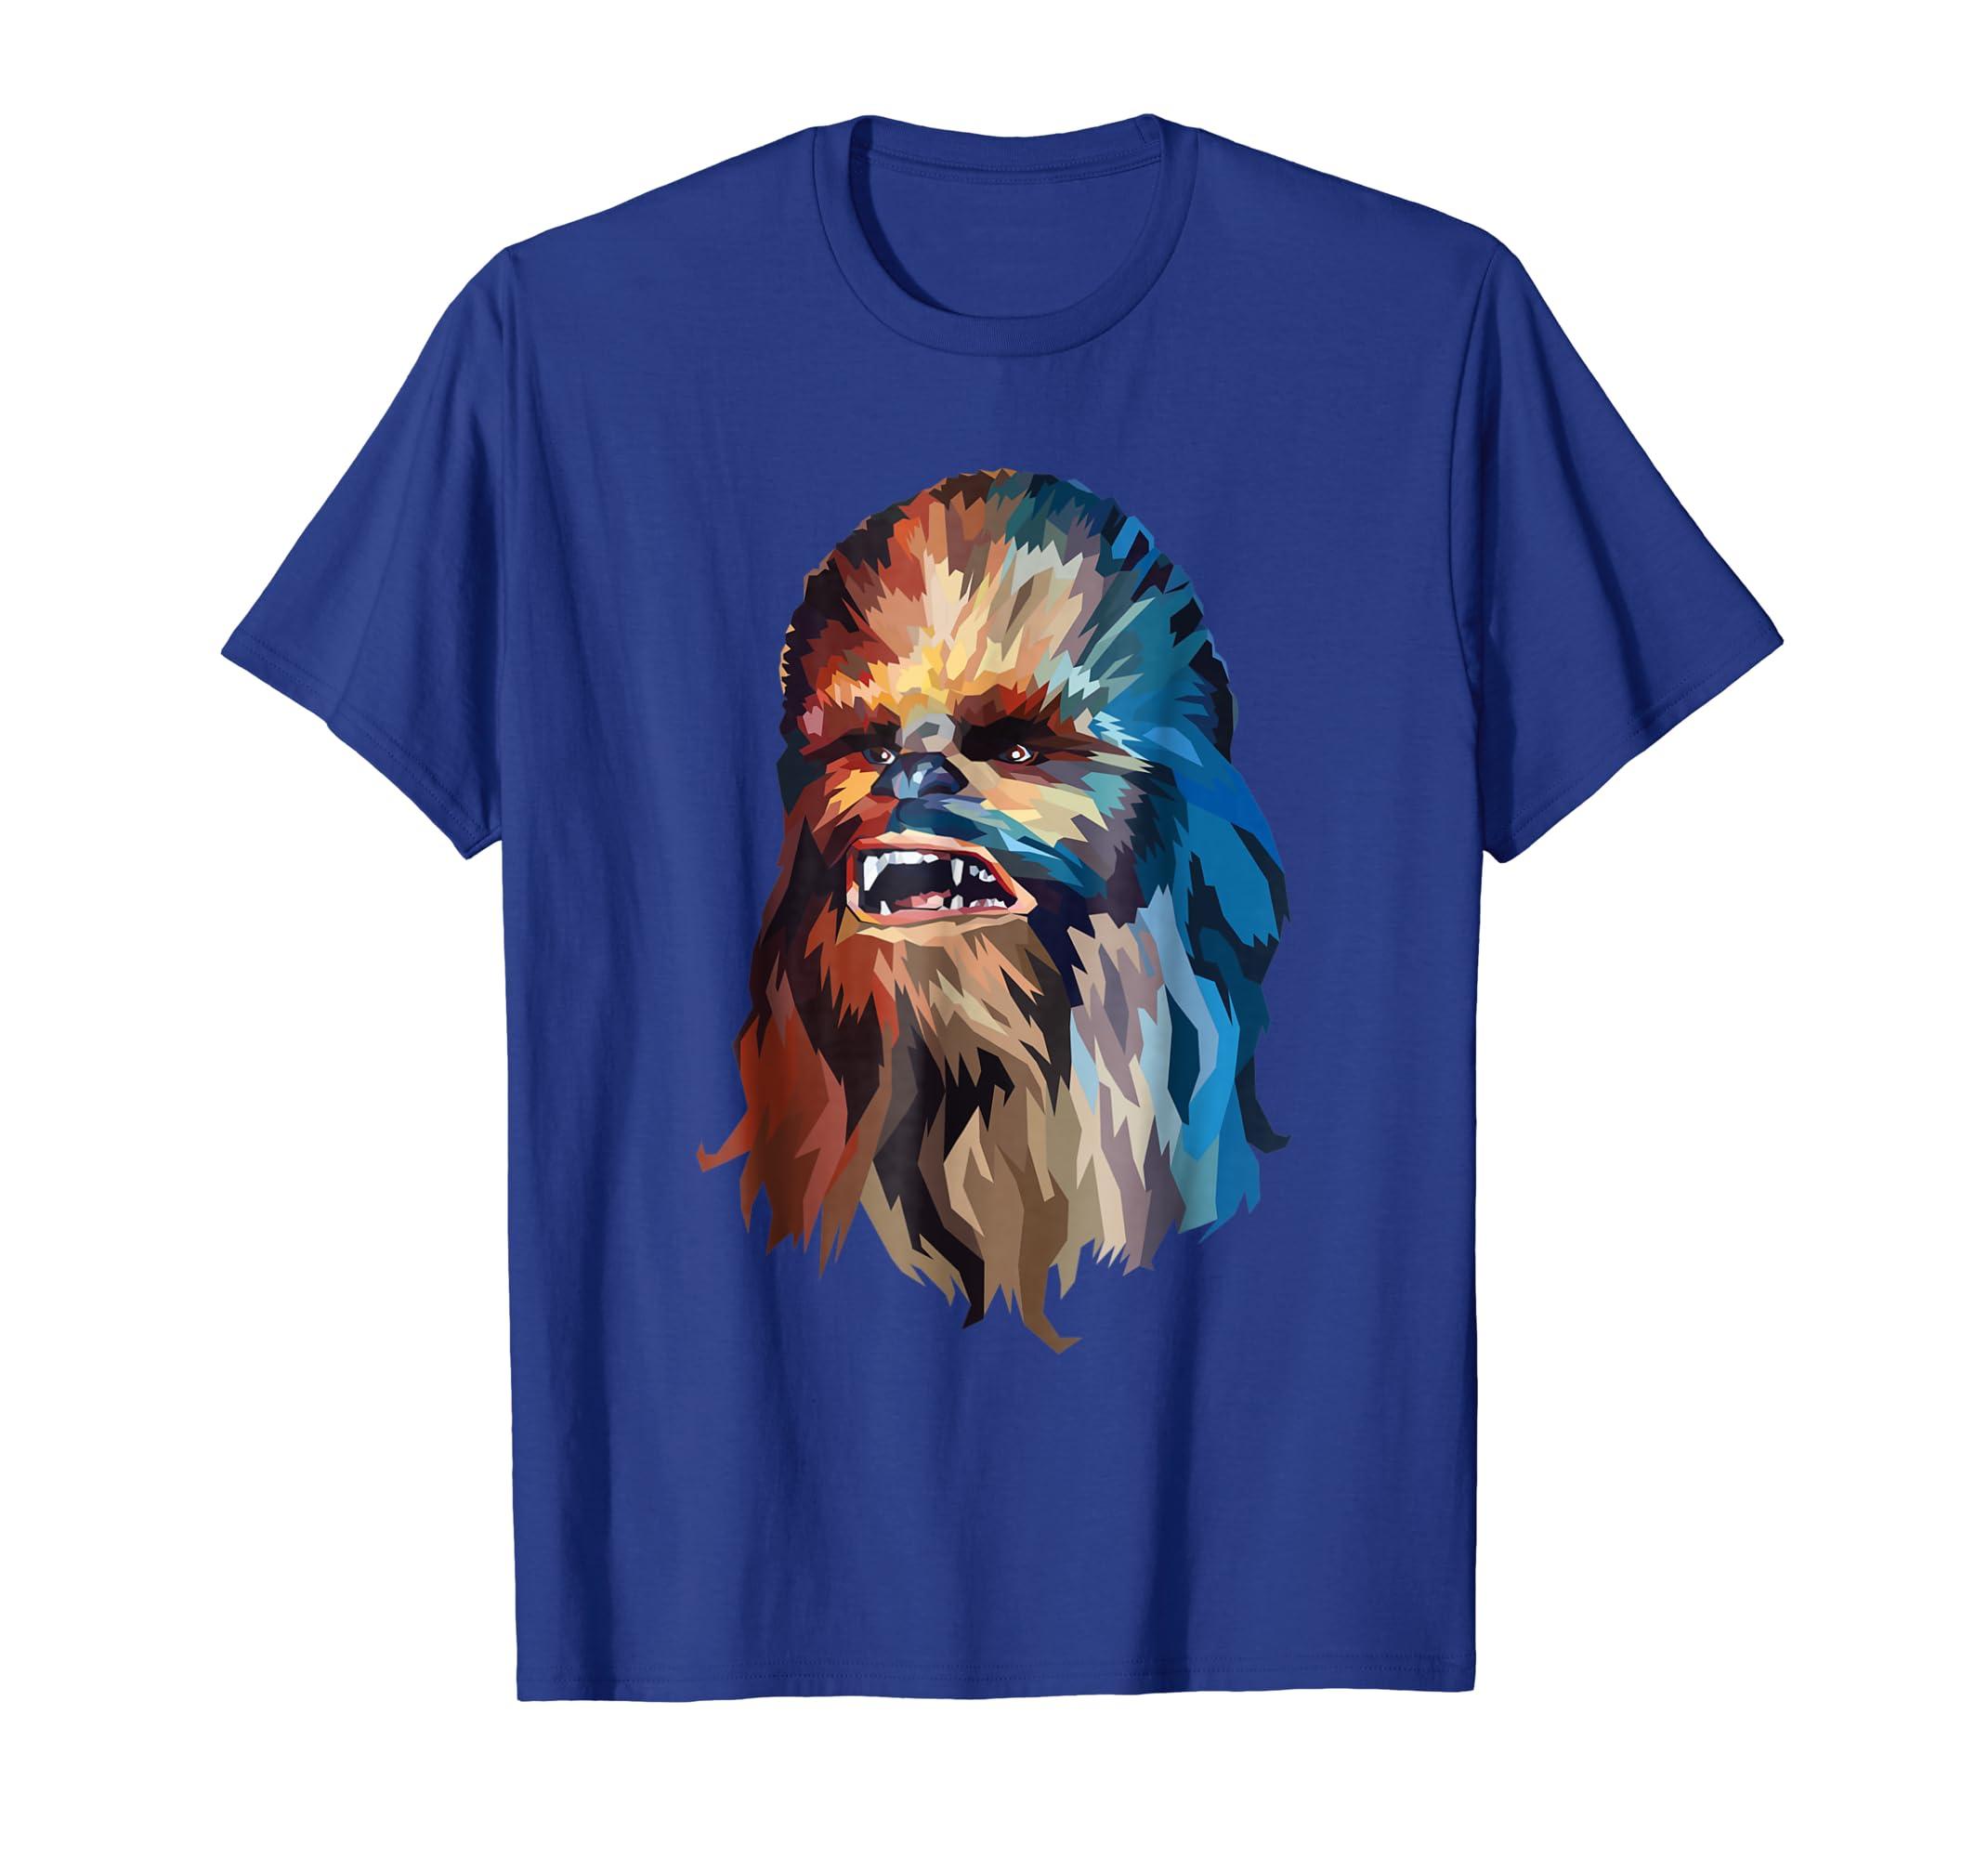 1783283e Amazon.com: Star Wars Chewbacca Art Graphic T-Shirt: Clothing